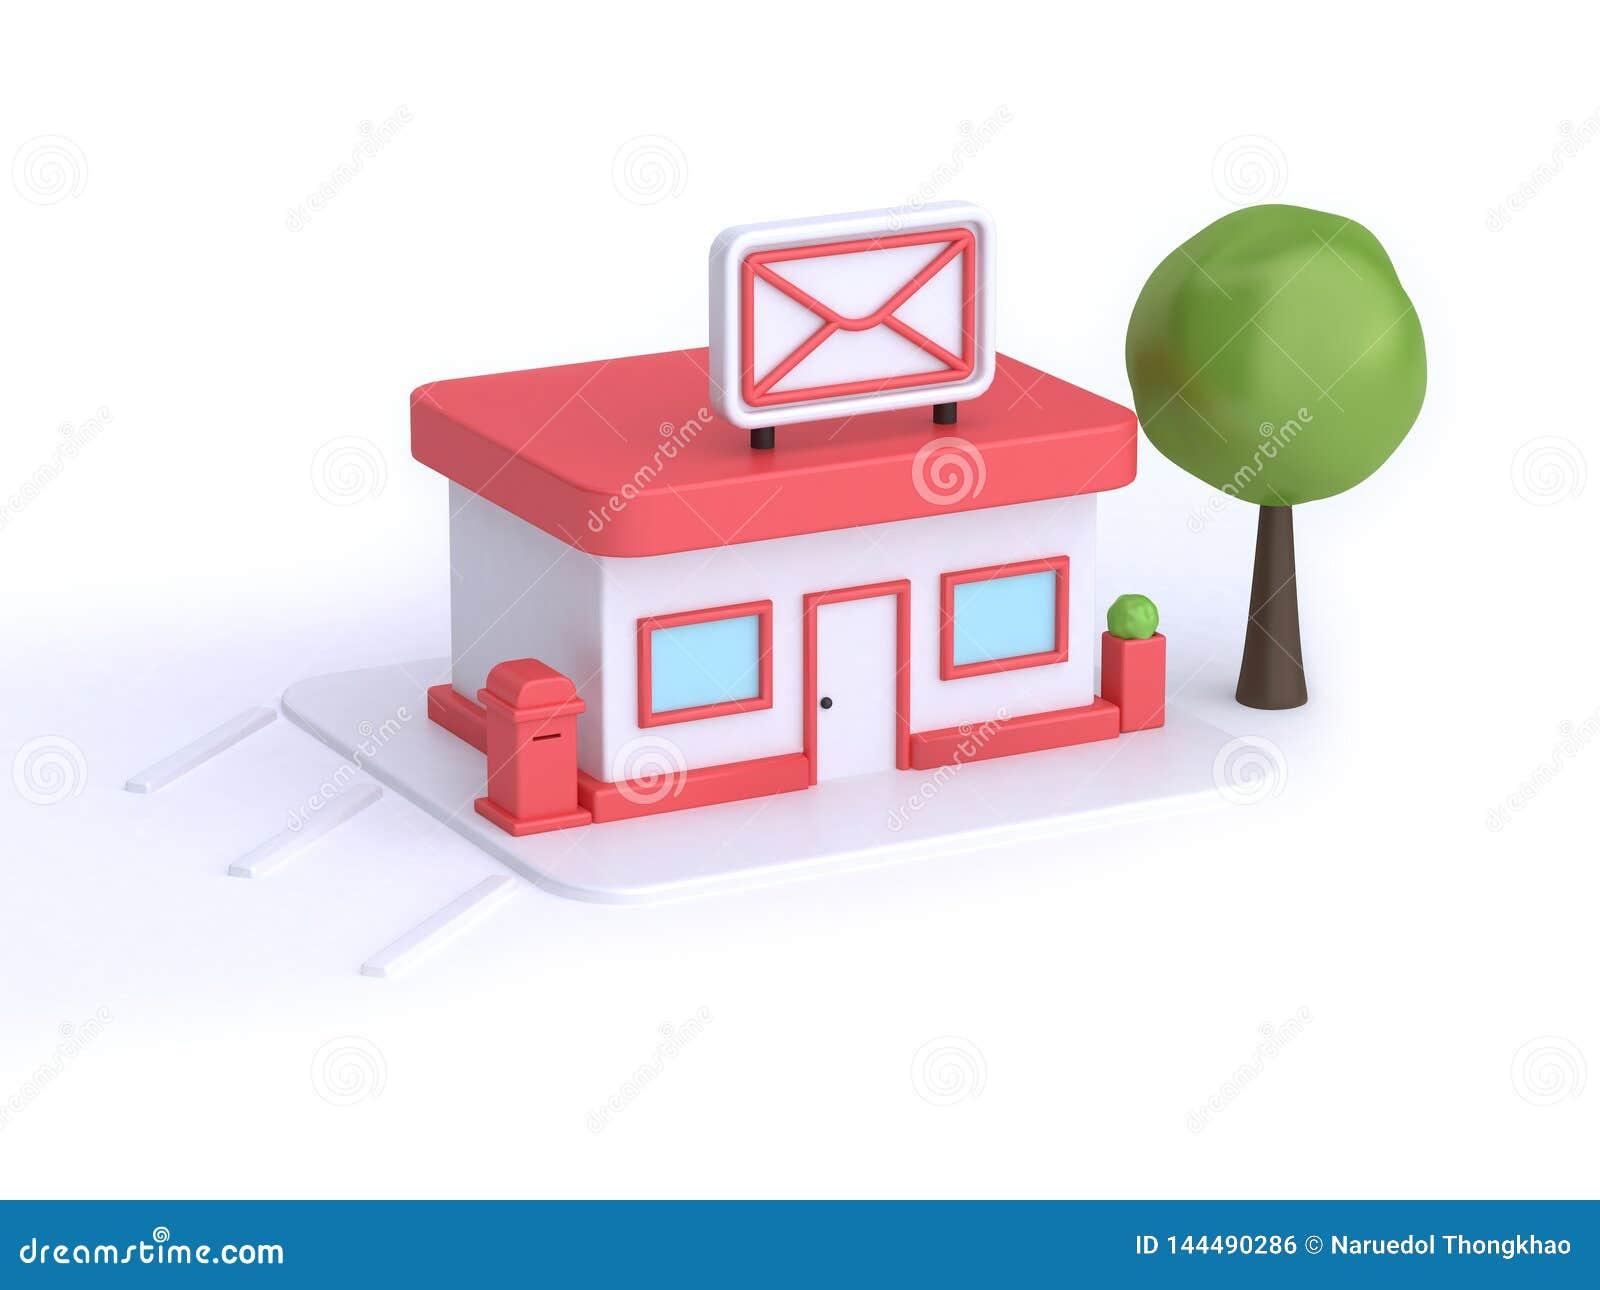 Download Post Office Building Cartoon Gif